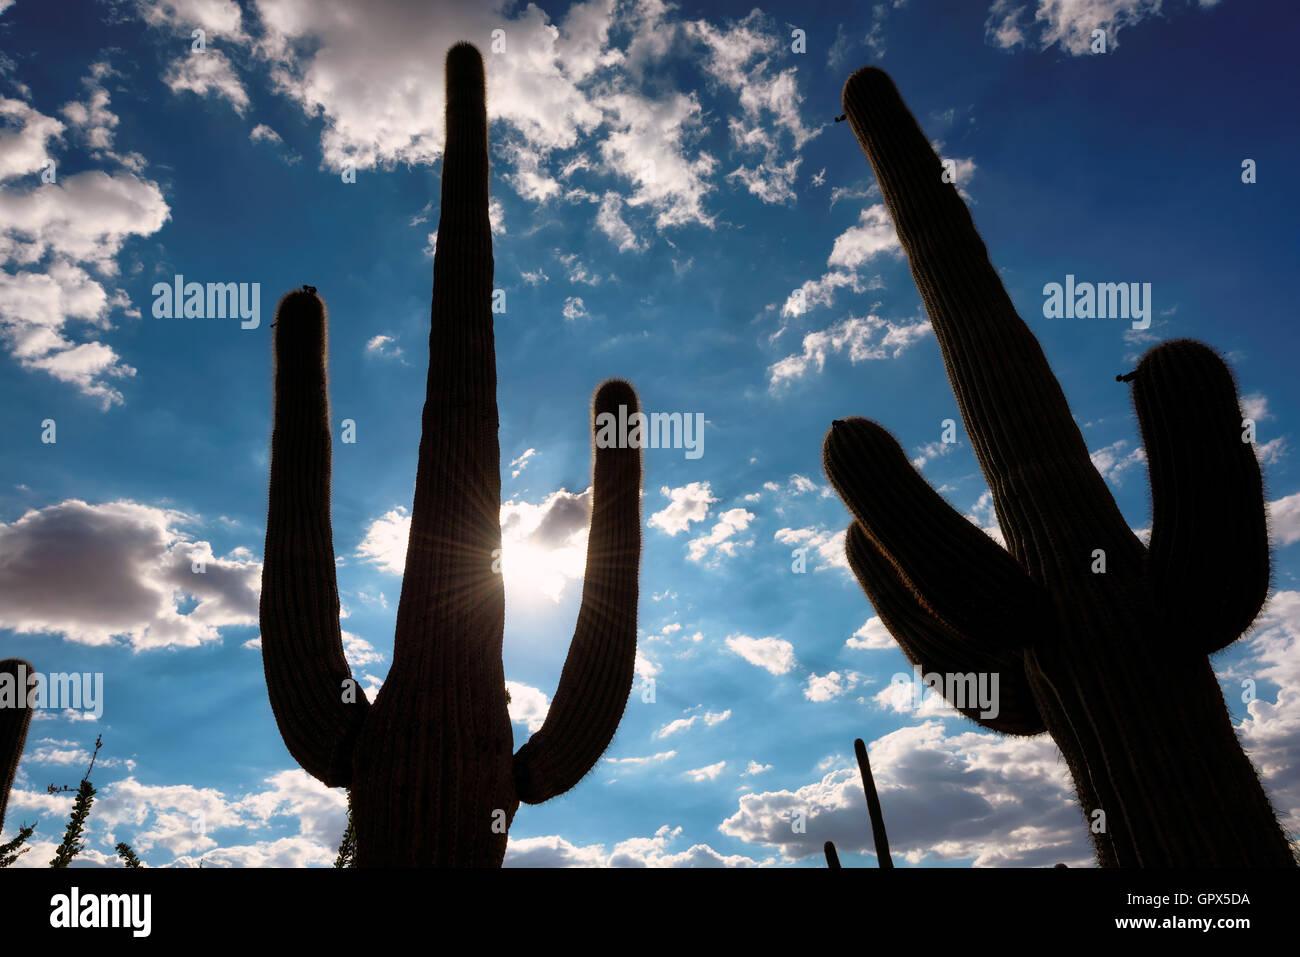 Saguaro cactus silhouette, backlit by the sun - Stock Image